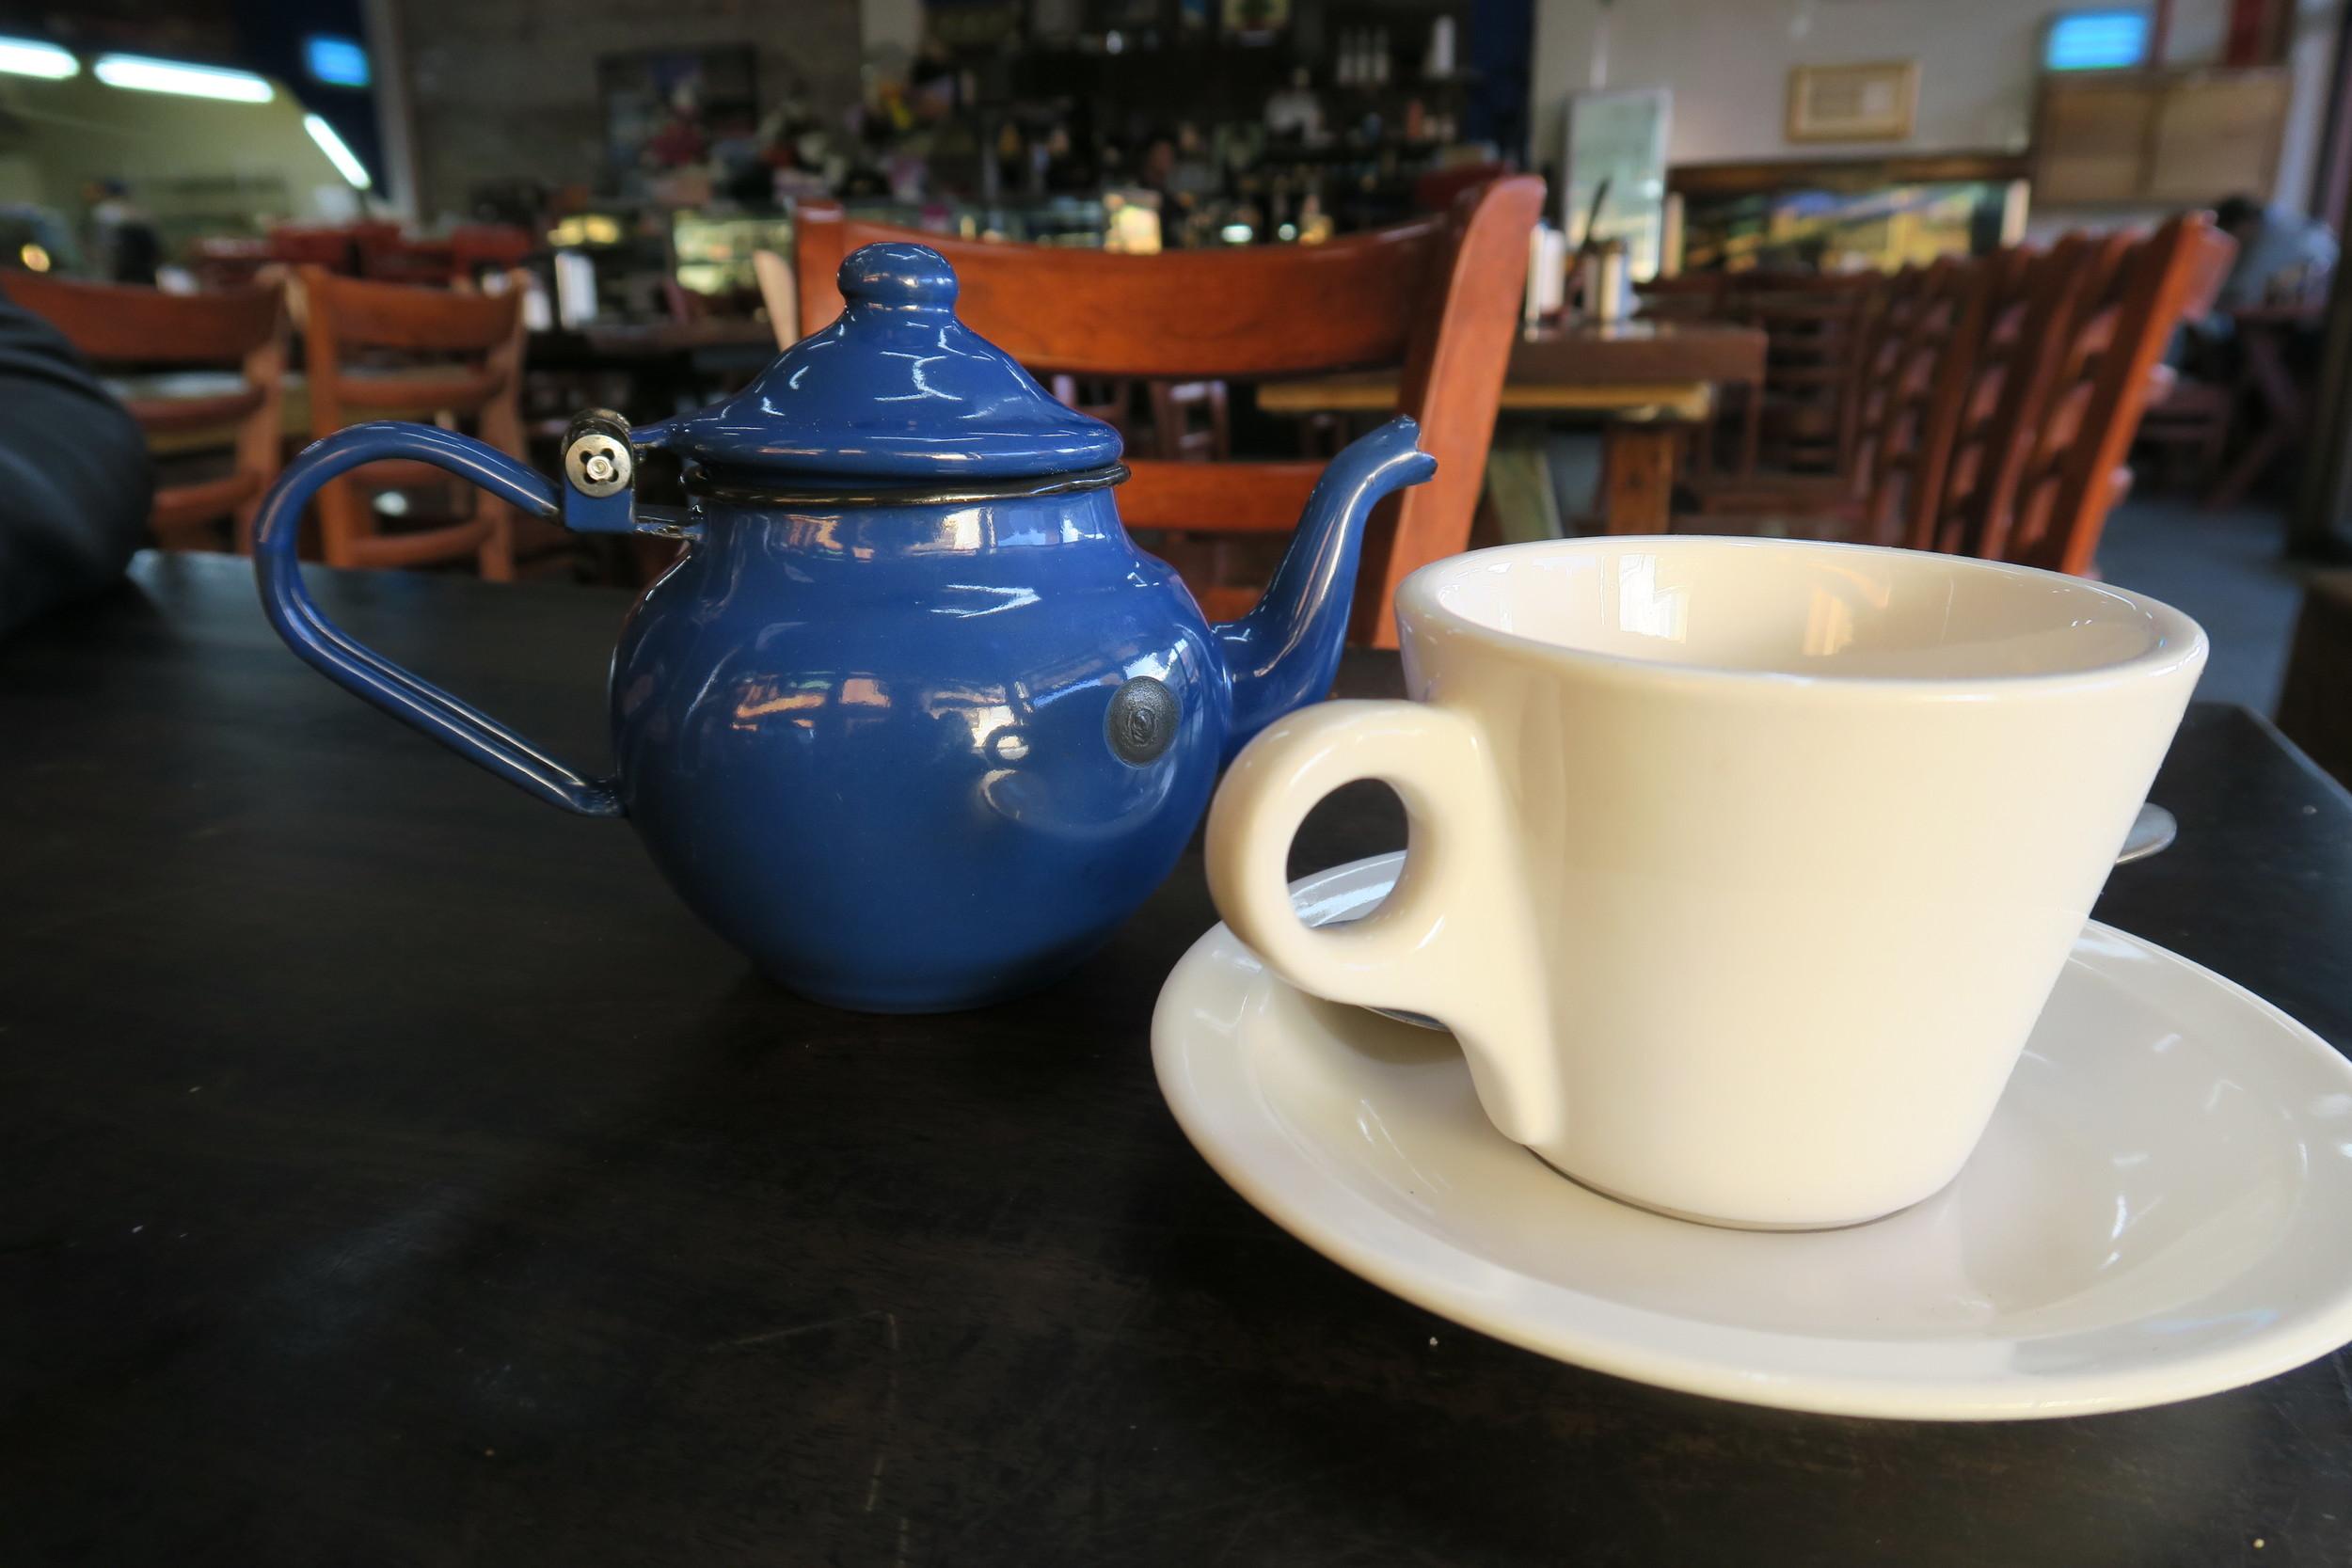 blue teapot and teacup